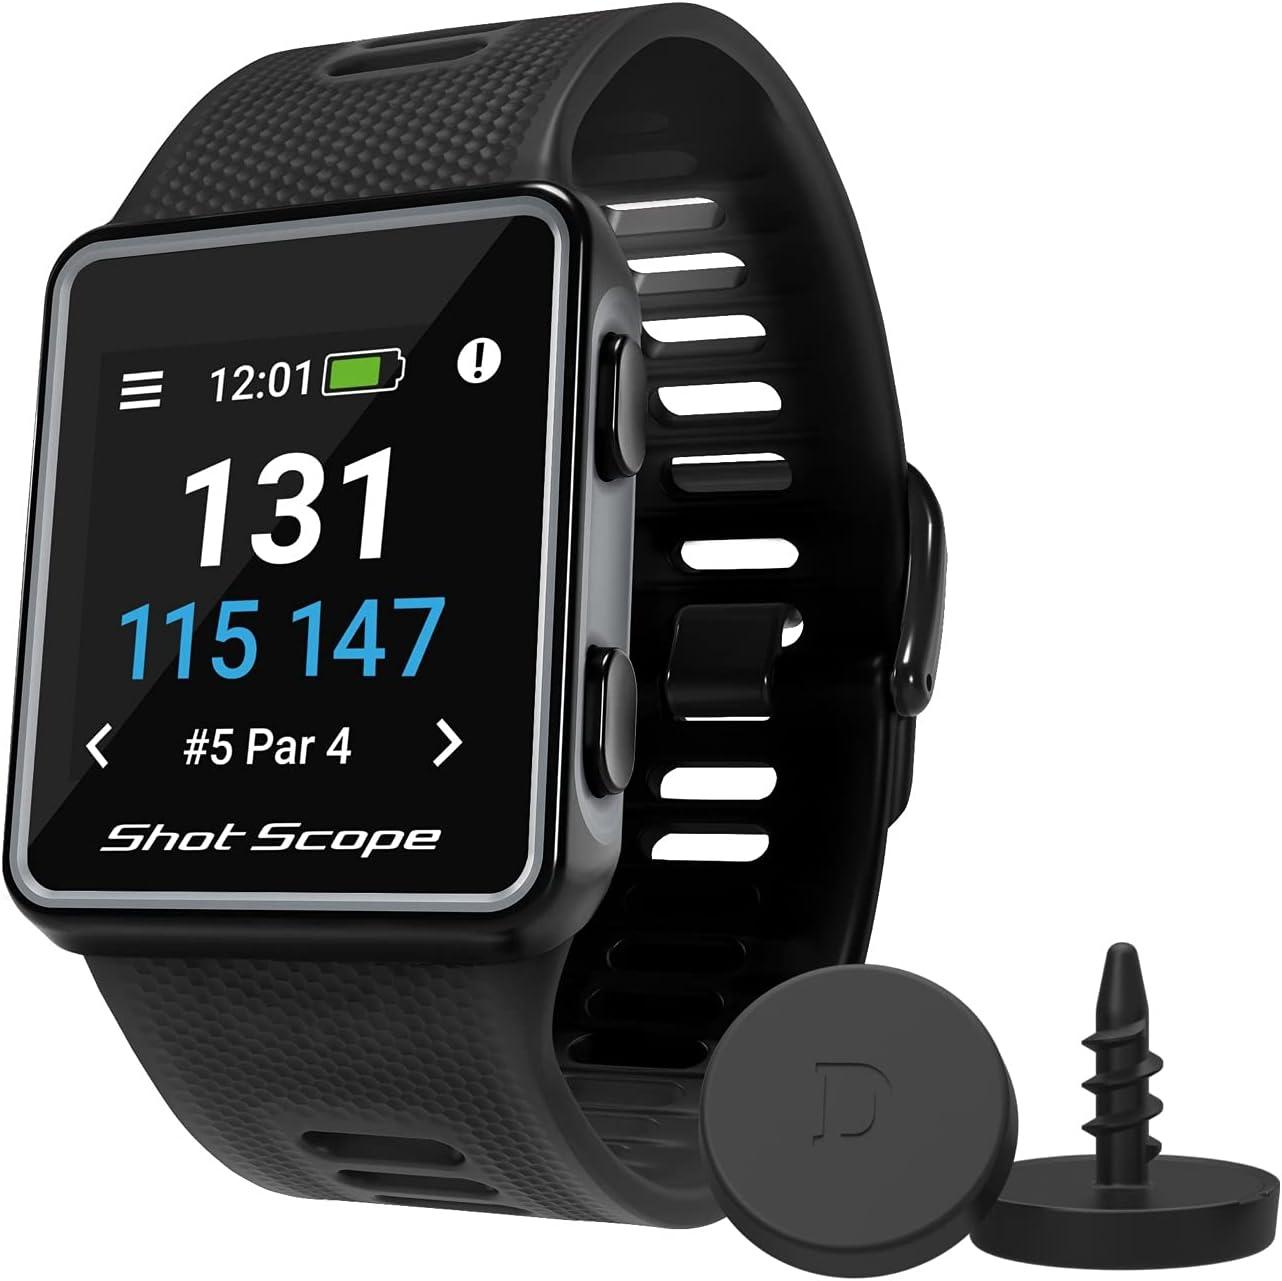 Shot Scope V3 GPS Watch - F Automatic + Baltimore Mall Hazard B 4 years warranty M S Distances